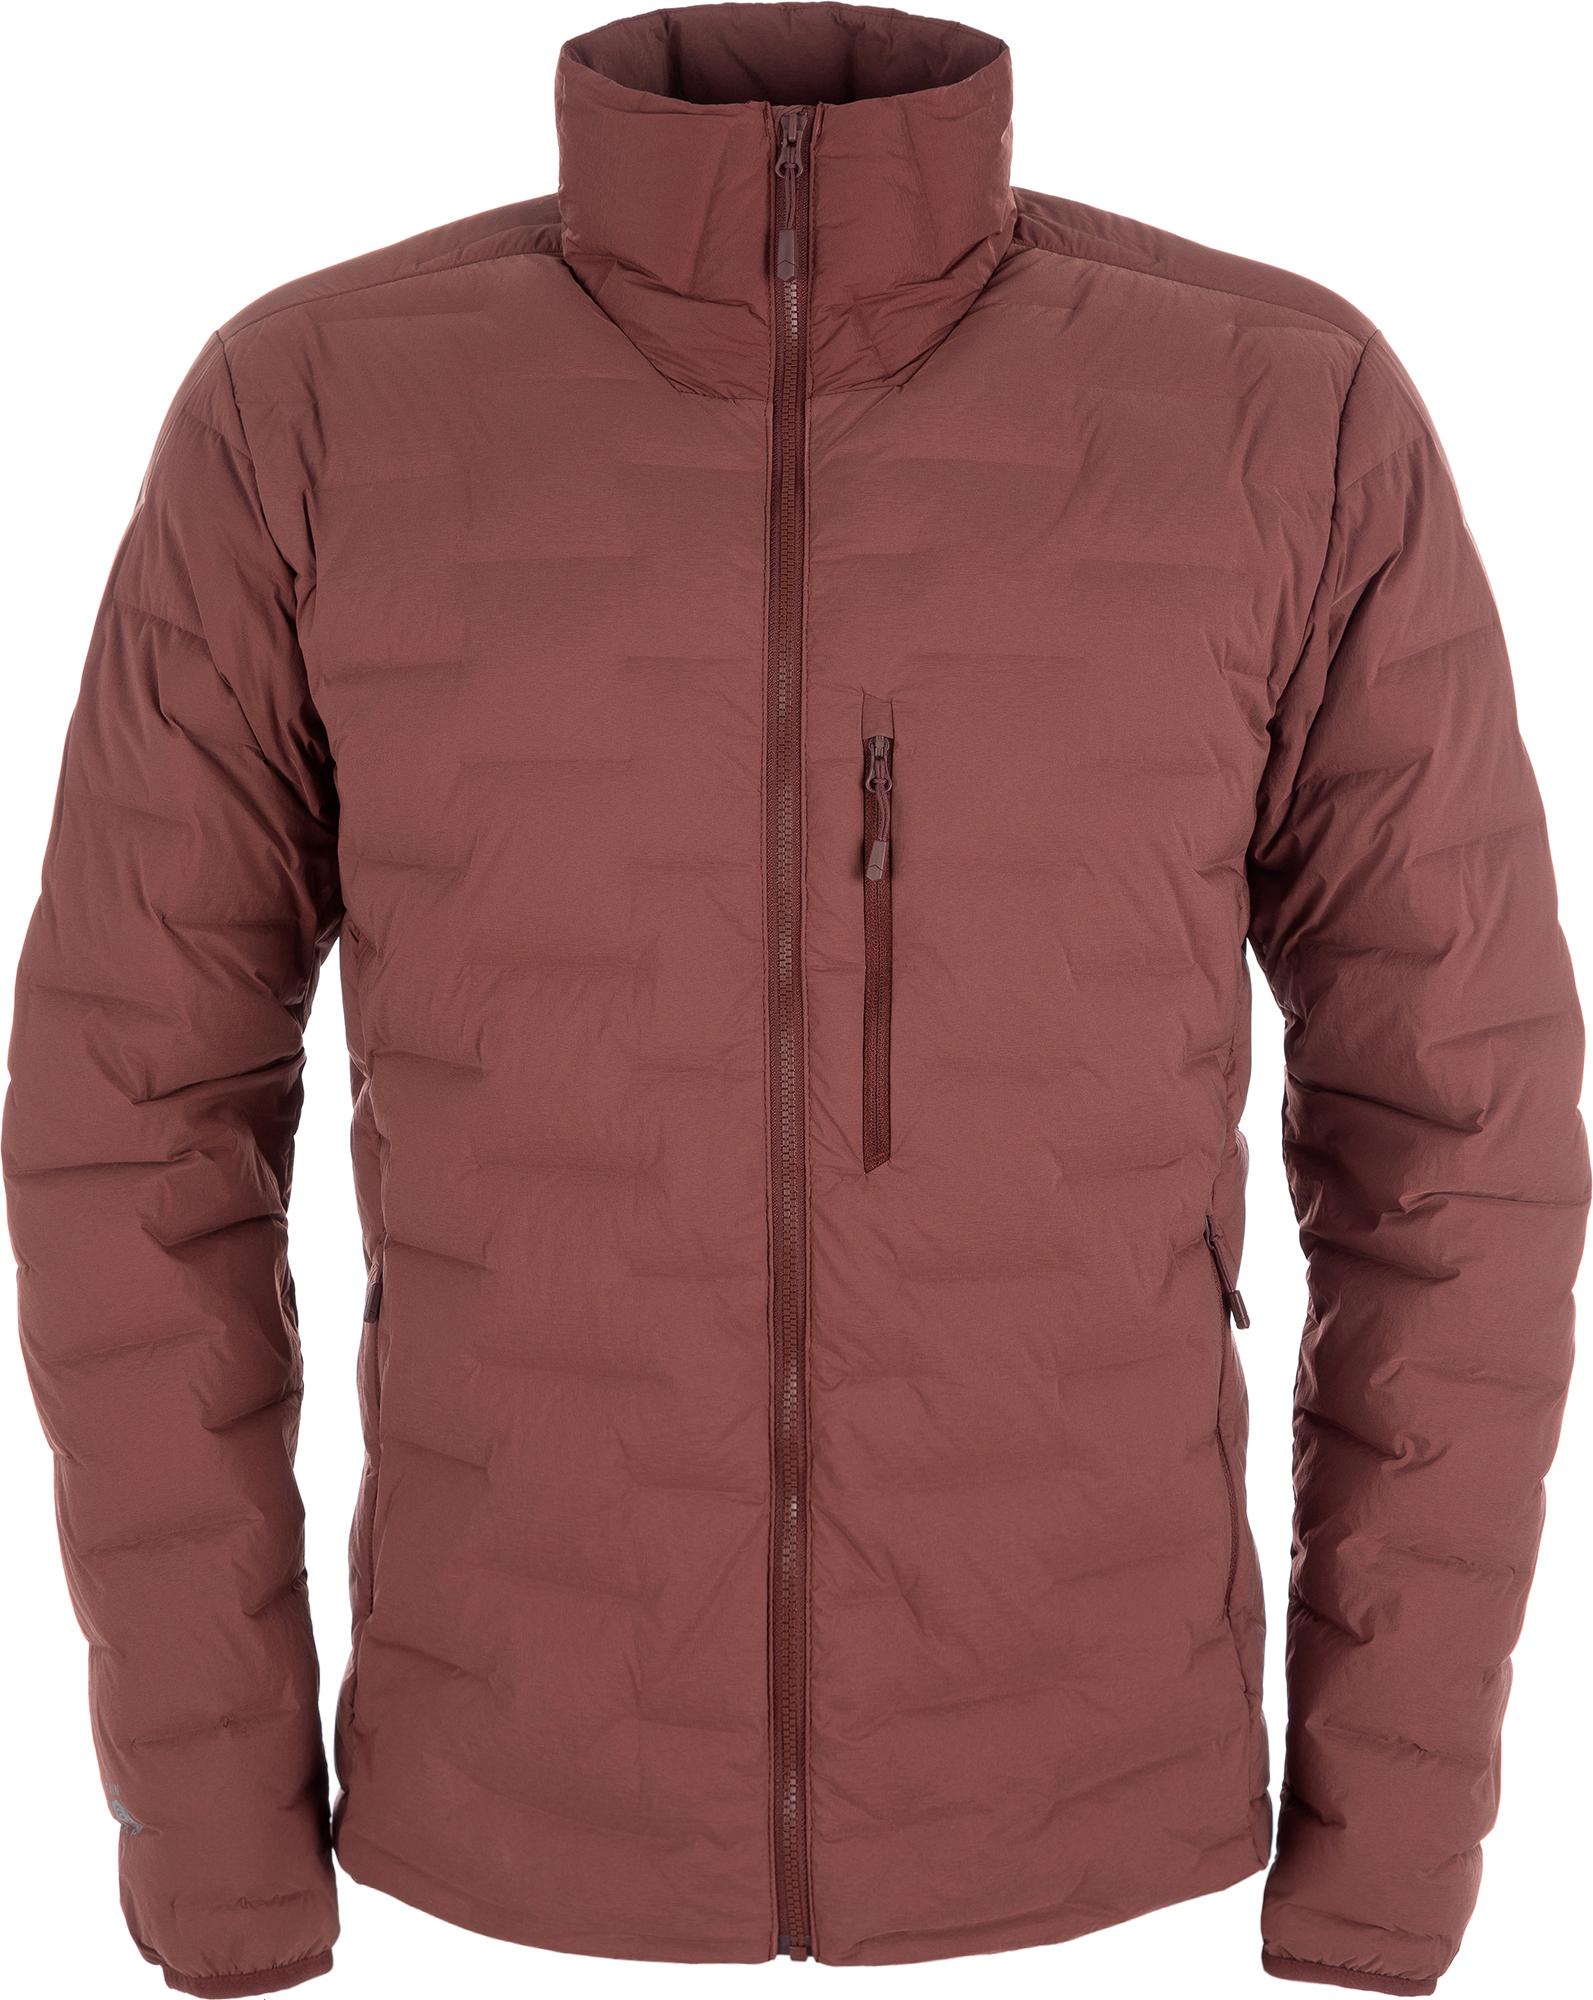 Mountain Hardwear Куртка пуховая мужская Mountain Hardwear Super DS™, размер 56 mountain hardwear куртка утепленная мужская mountain hardwear radian размер 56